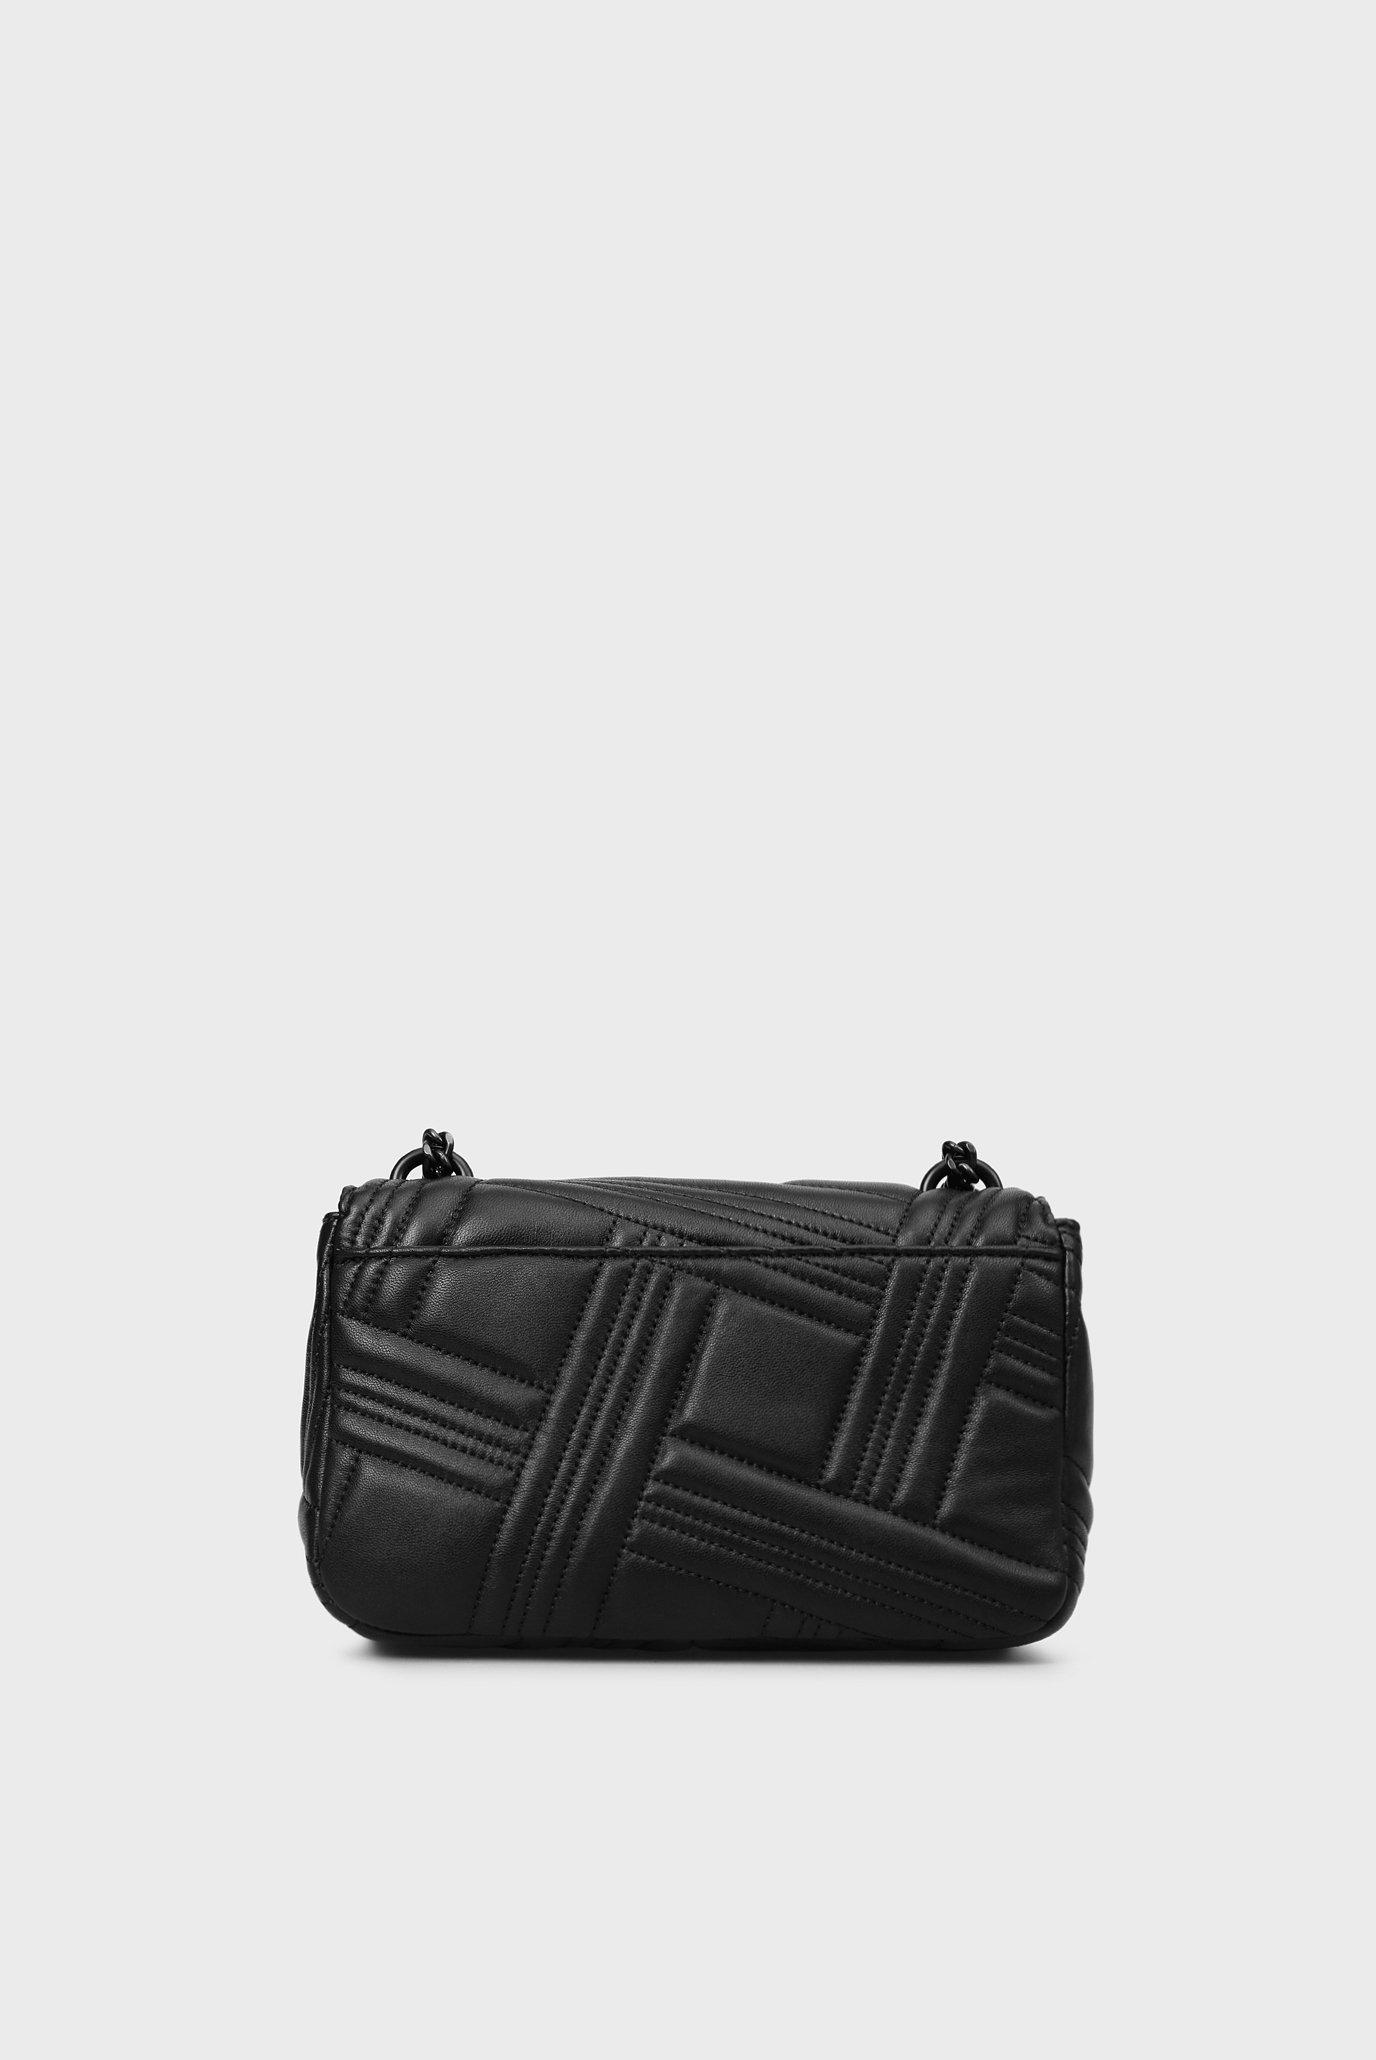 824b276fb3dc купить женская черная кожаная сумка через плечо Dkny Dkny R833b638